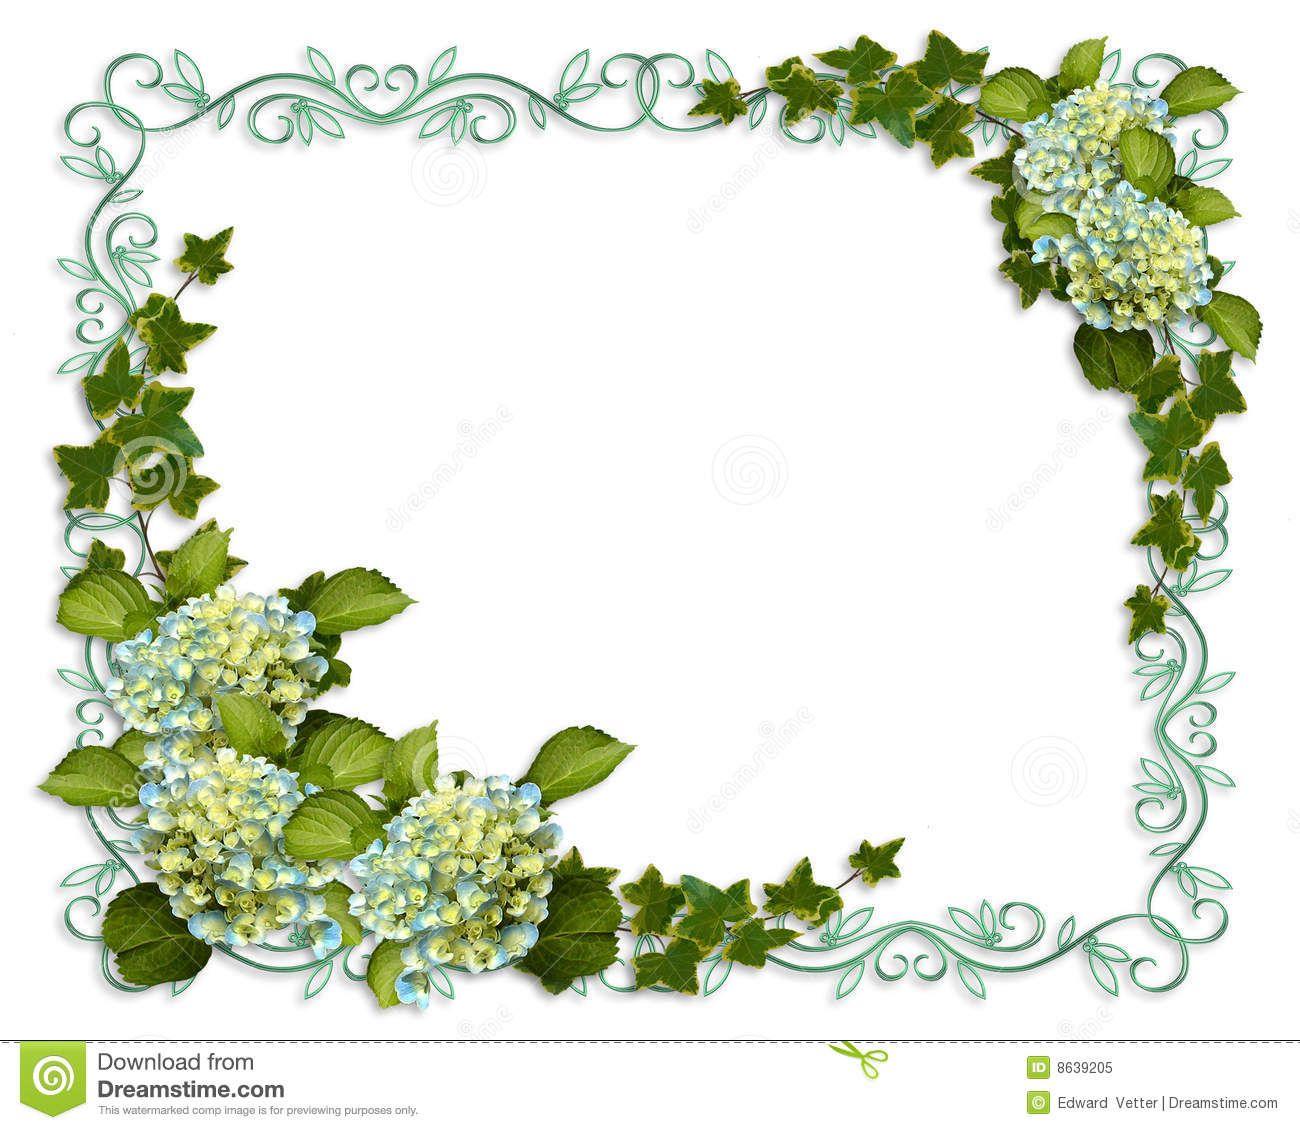 Wedding And Certificate Floral Border Border Clipart: Hydrangea Stock Illustrations, Vectors, & Clipart